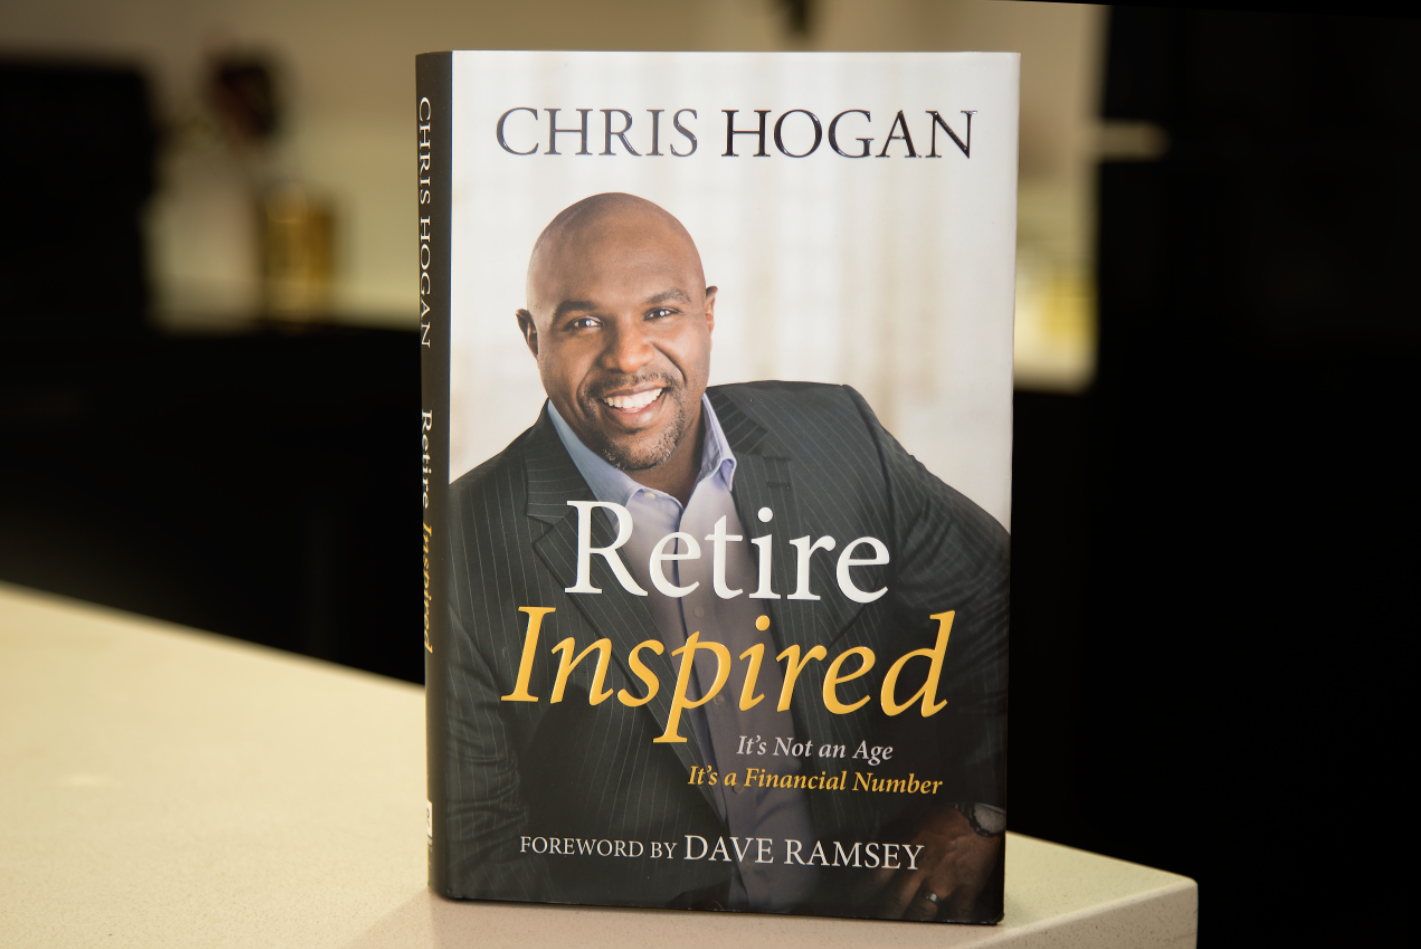 Retire Inspired Chris Hogan Inspiration Art Is Being